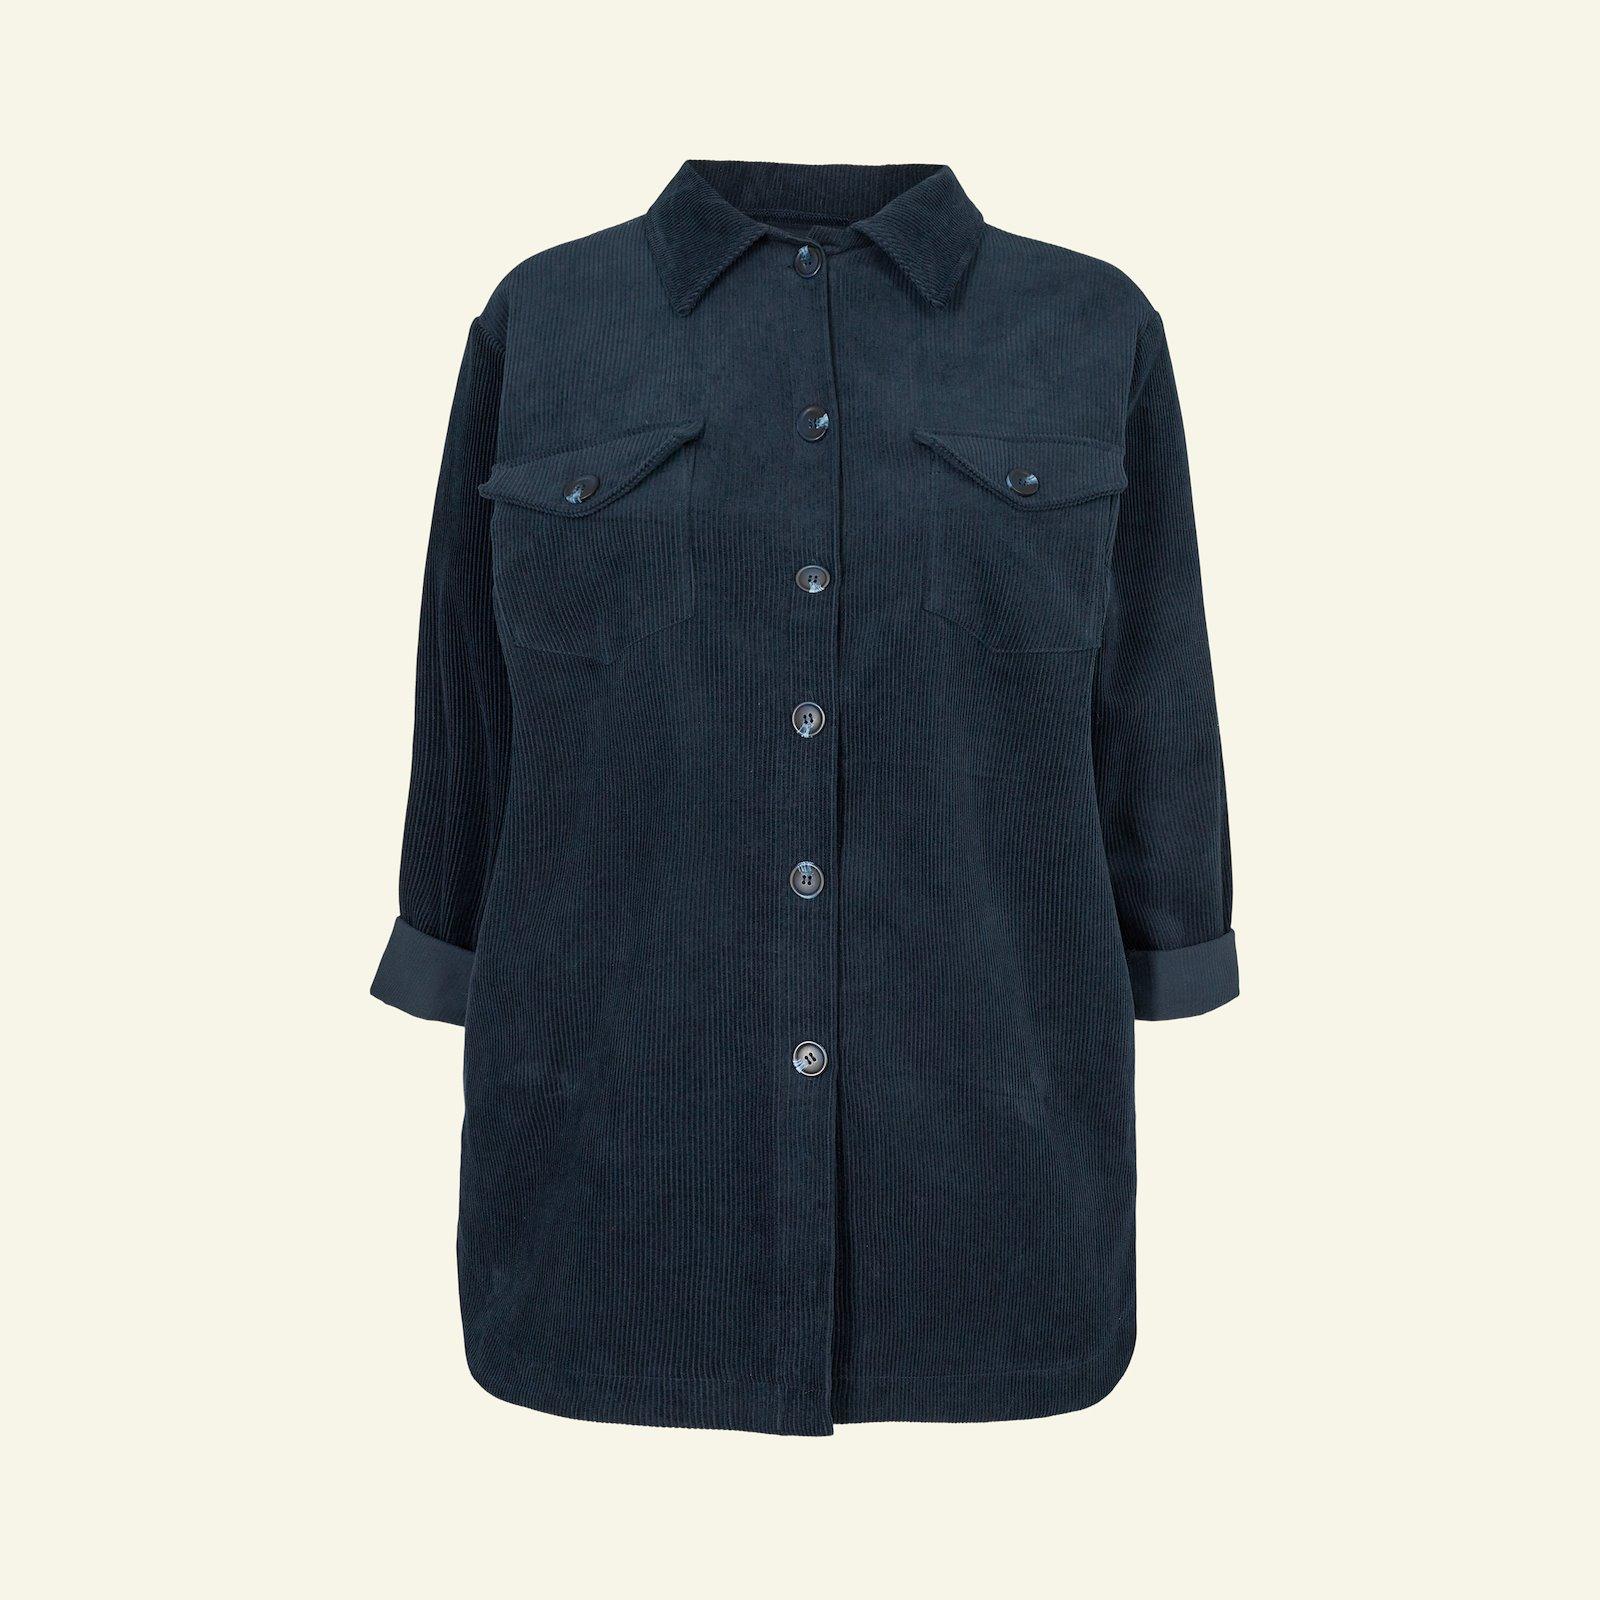 Shirt jacket, 58/30 p74001_430305_33118_sskit